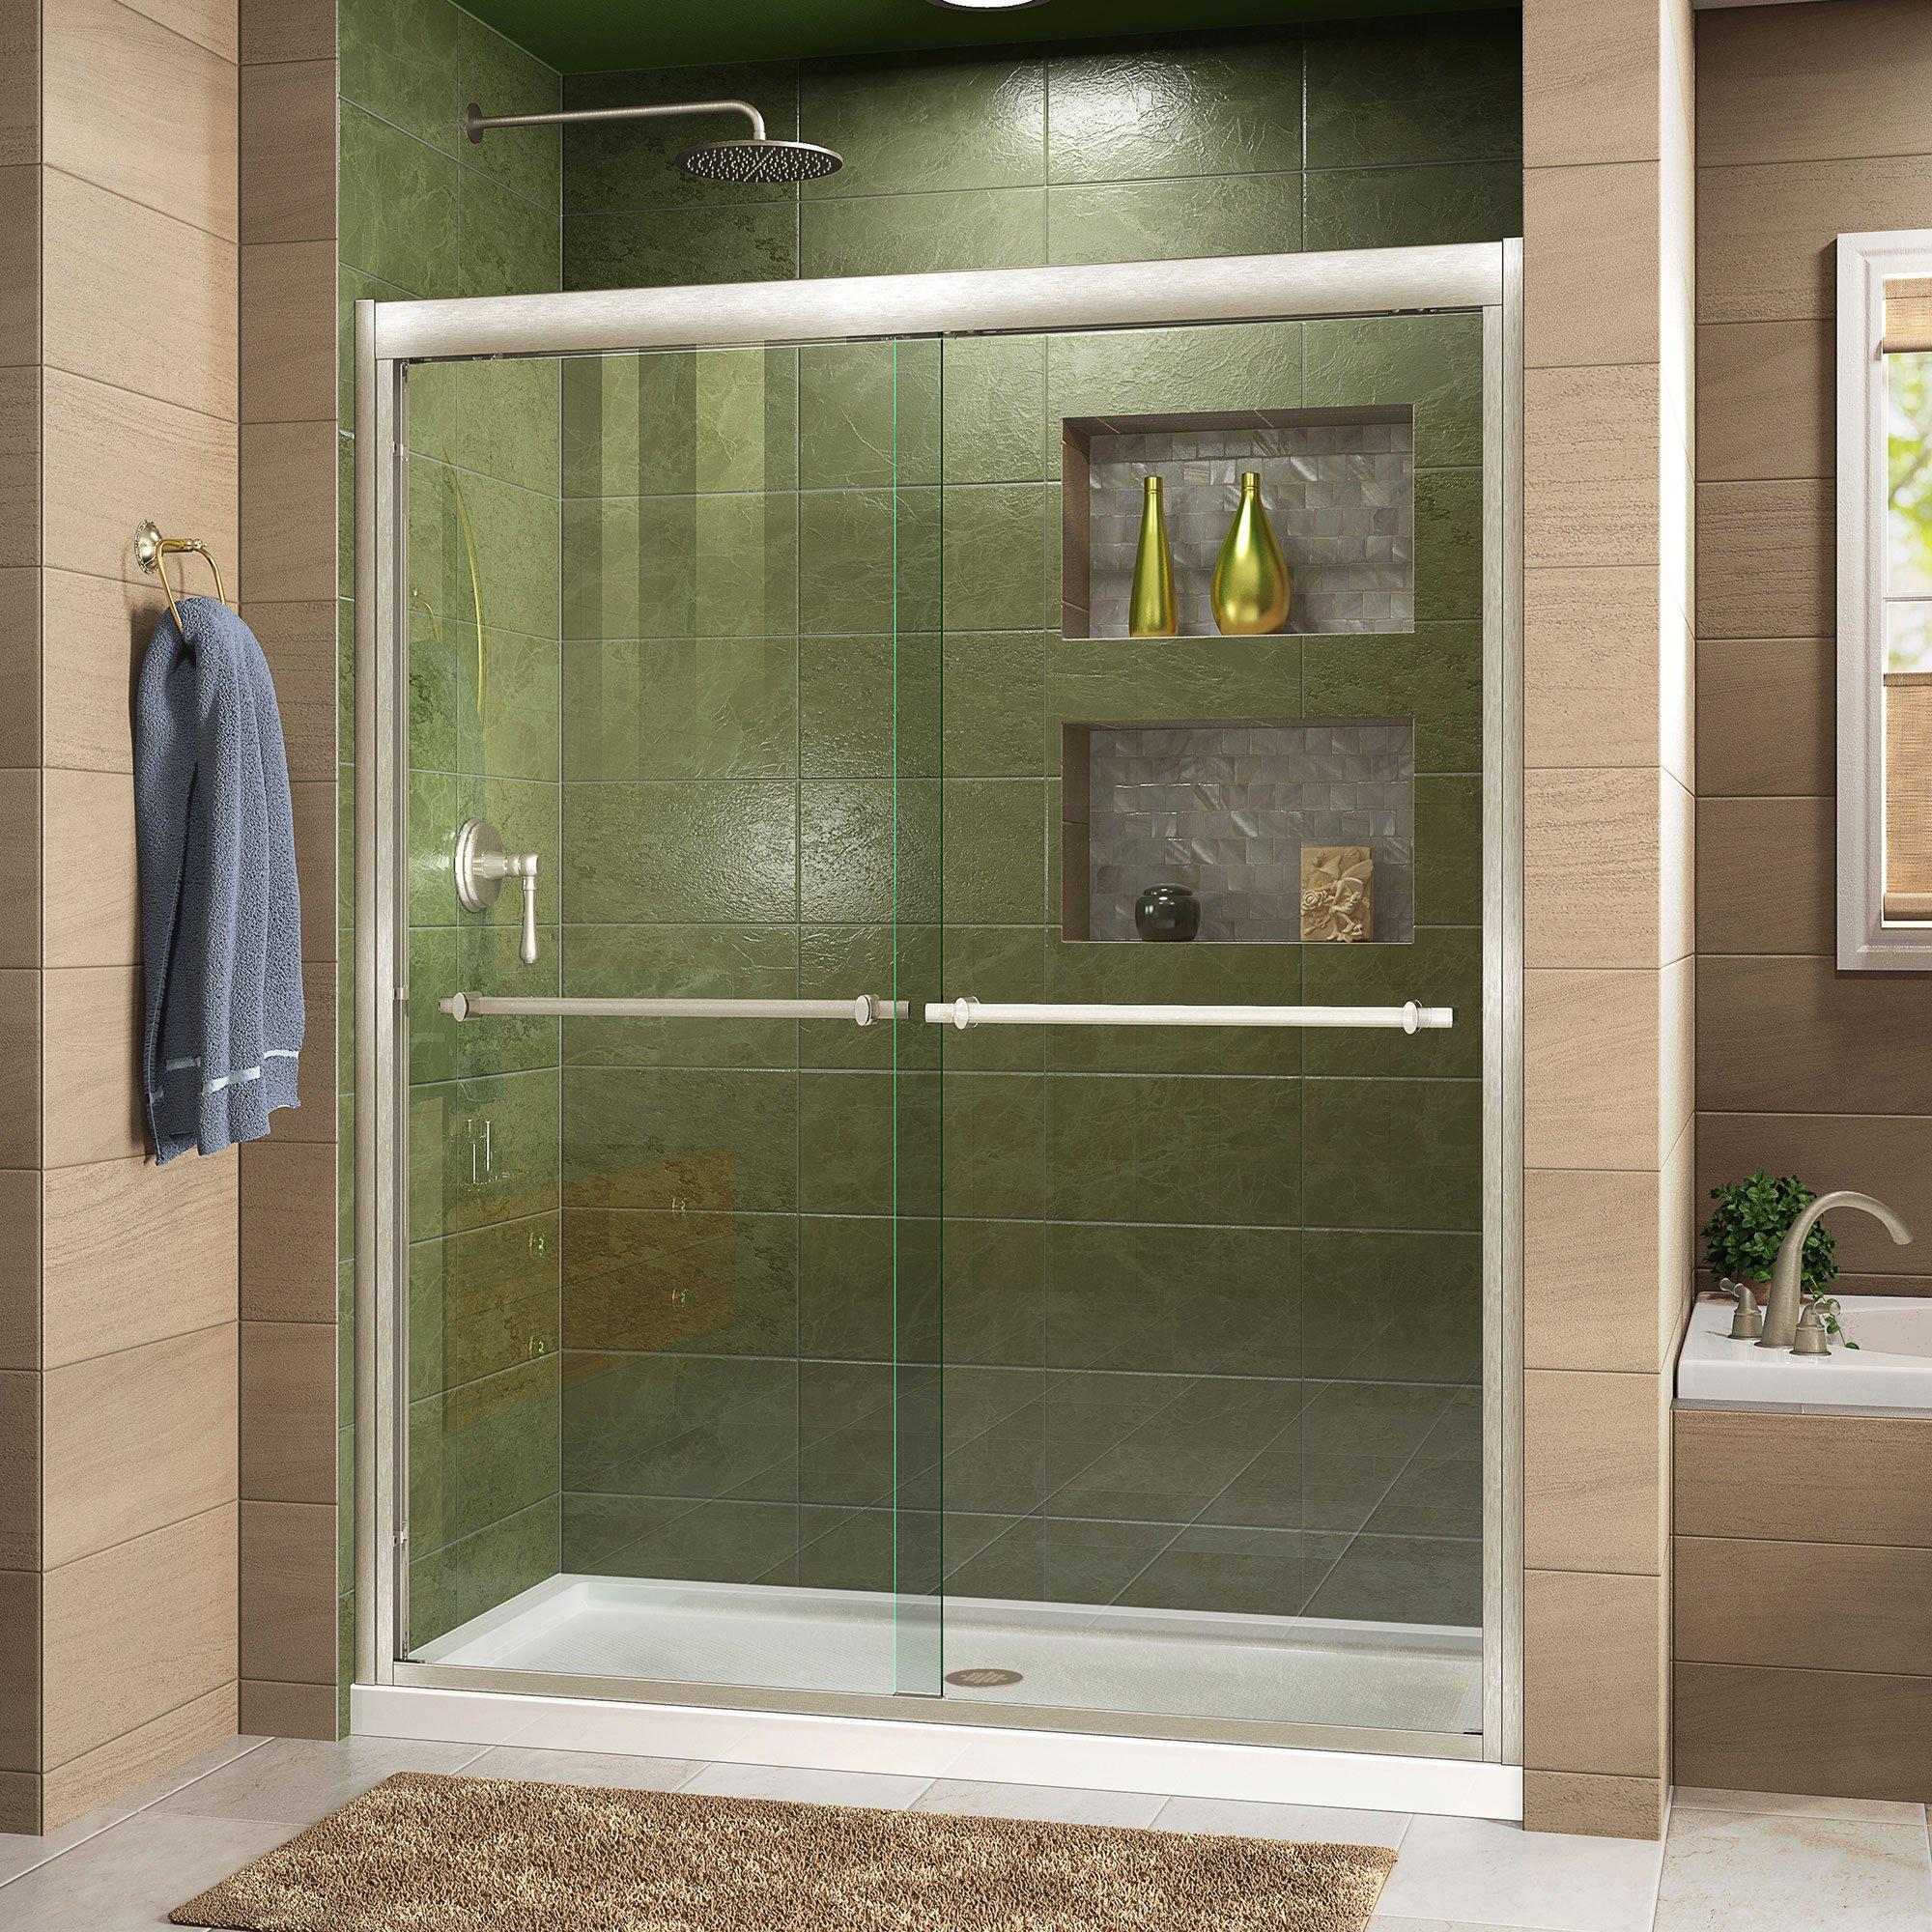 Best Rated in Shower Doors & Helpful Customer Reviews - Amazon.com